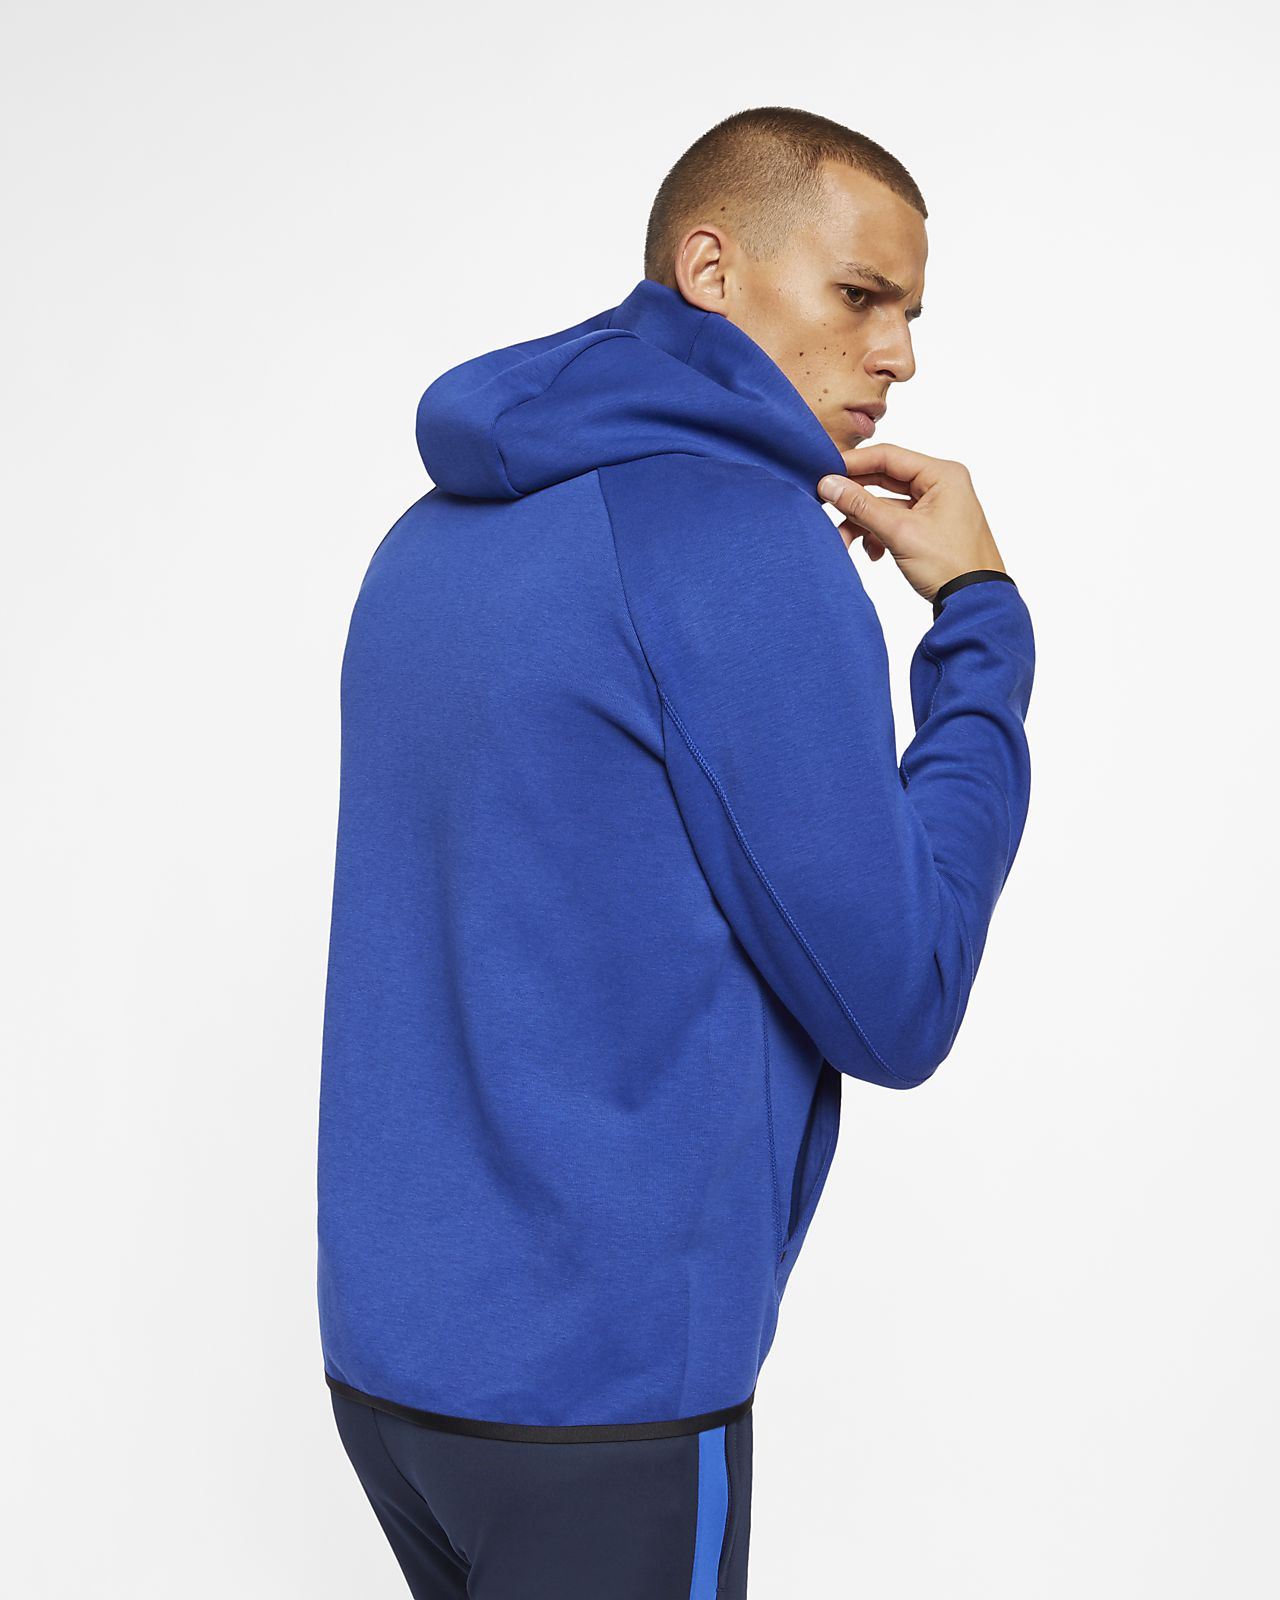 893e2d0c1e3 Chelsea FC Tech Fleece Men s Full-Zip Hoodie. Nike.com GB